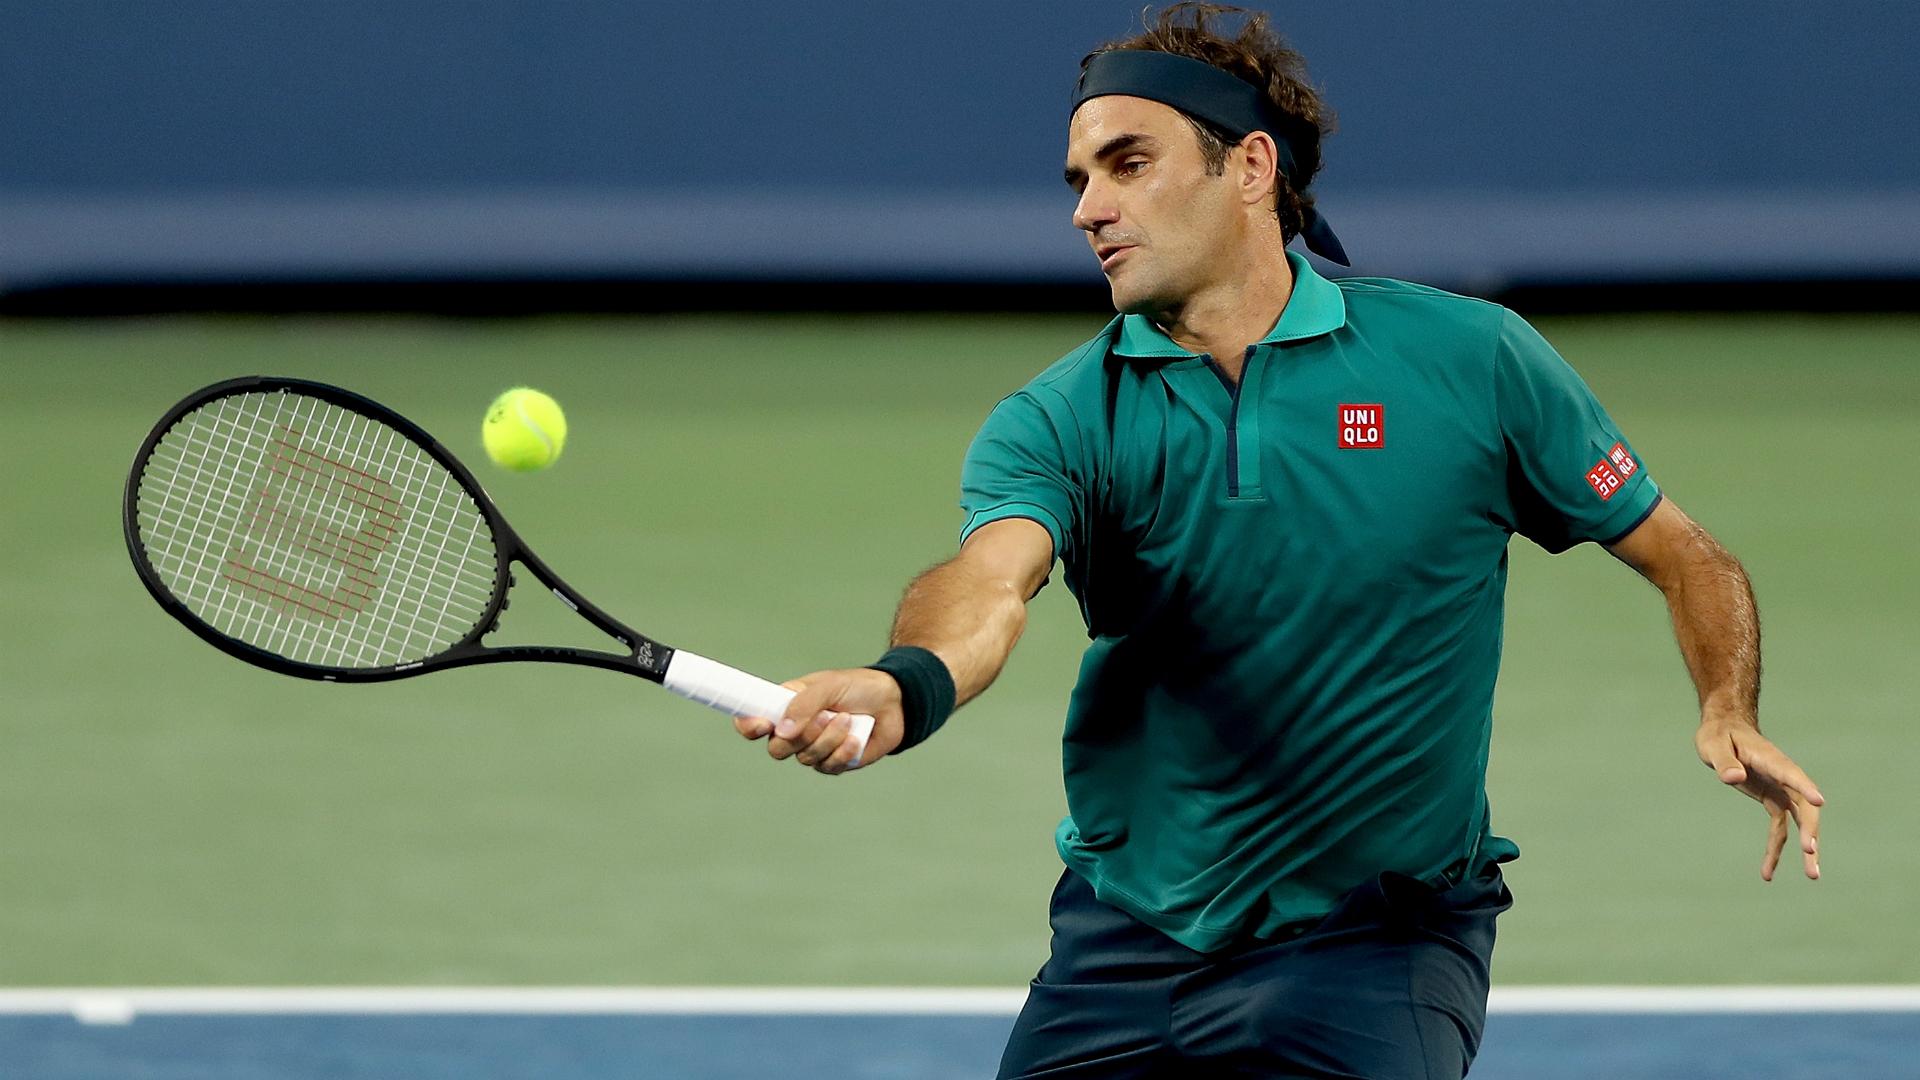 Roger Federer barely raised a sweat as he accounted for Juan Ignacio Londero 6-3 6-4 in Cincinnati on Tuesday.